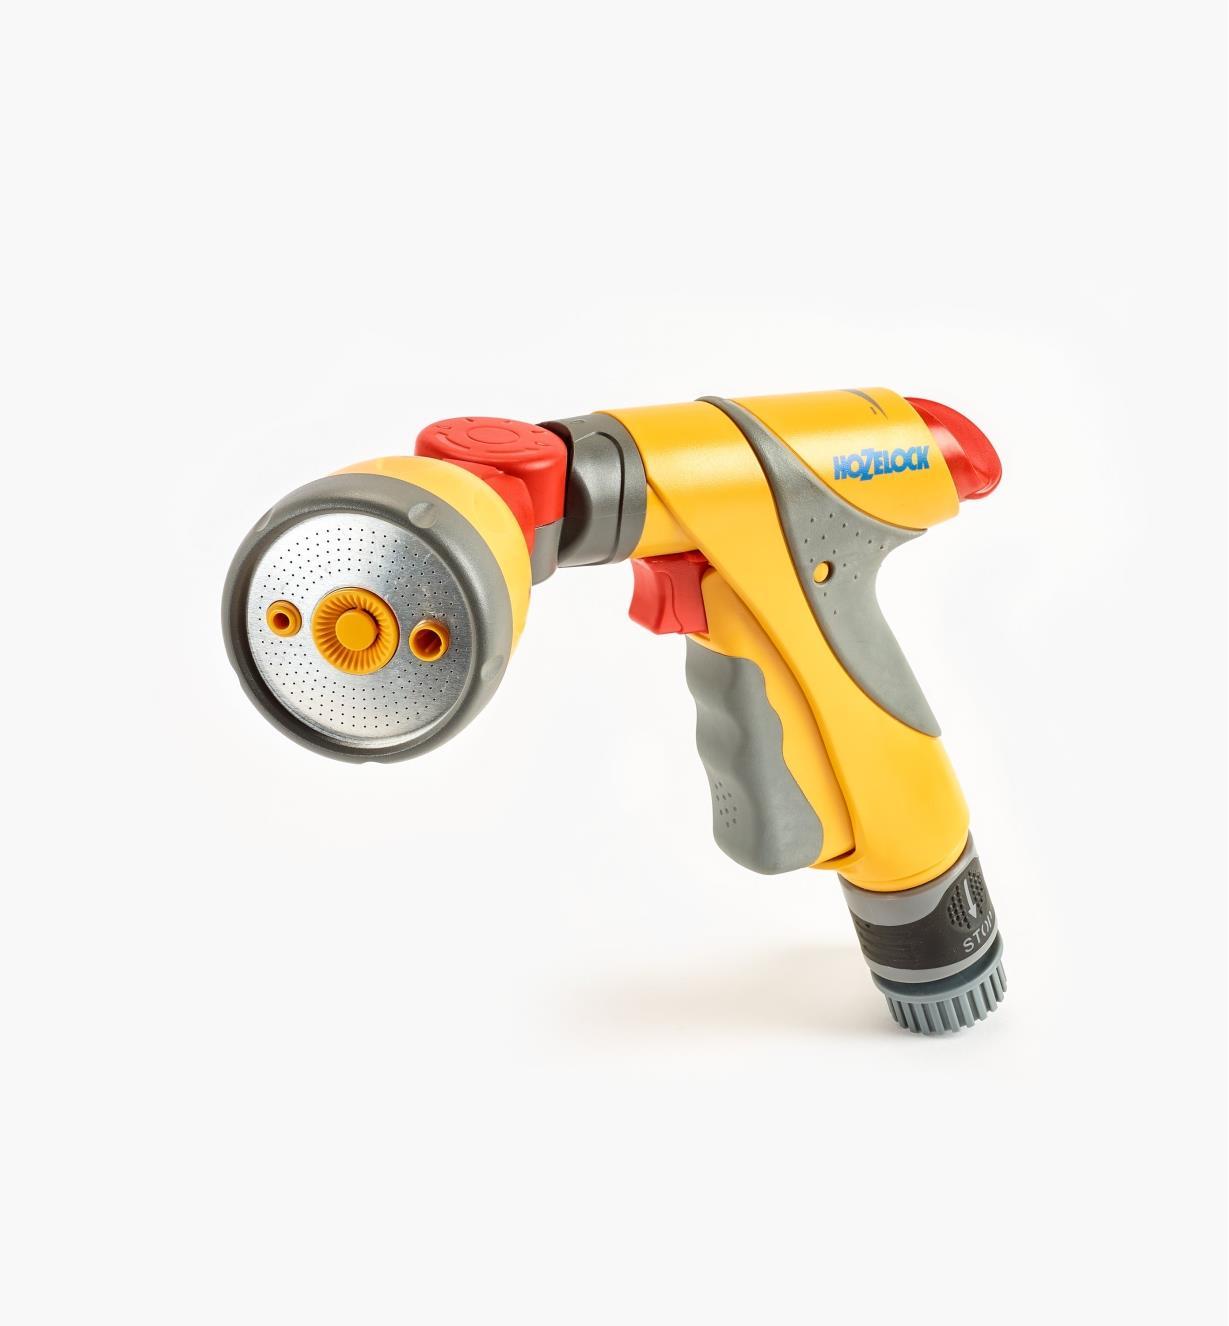 AL848 - Hozelock Ultra Twist Sprayer/Spot Sprinkler